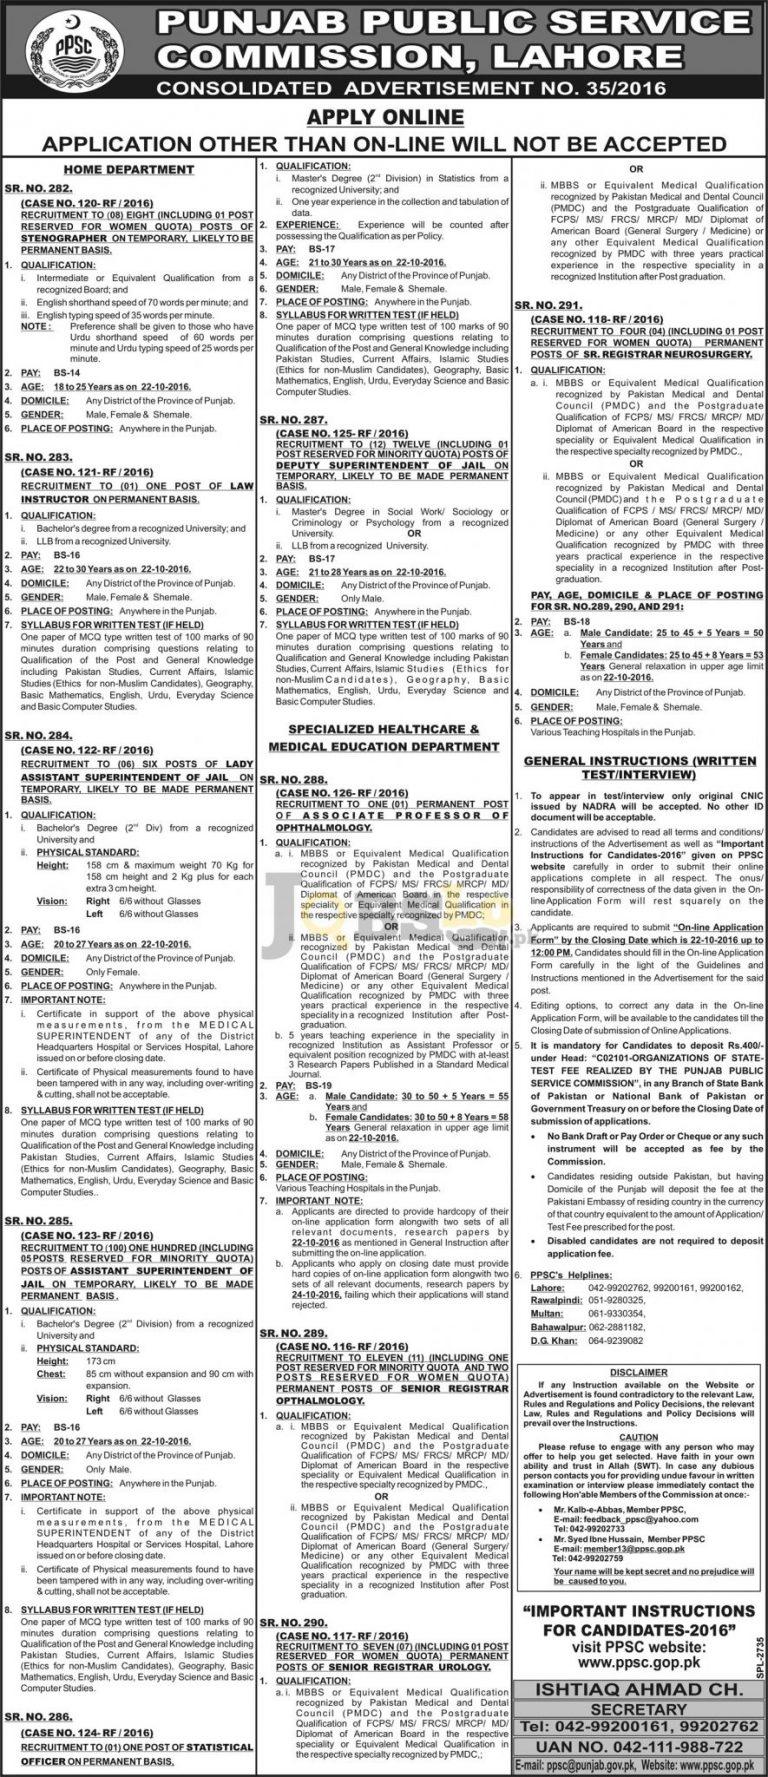 PPSC Jobs Advertisement No35/2016 Home Department Apply Online ppsc.gop.pk